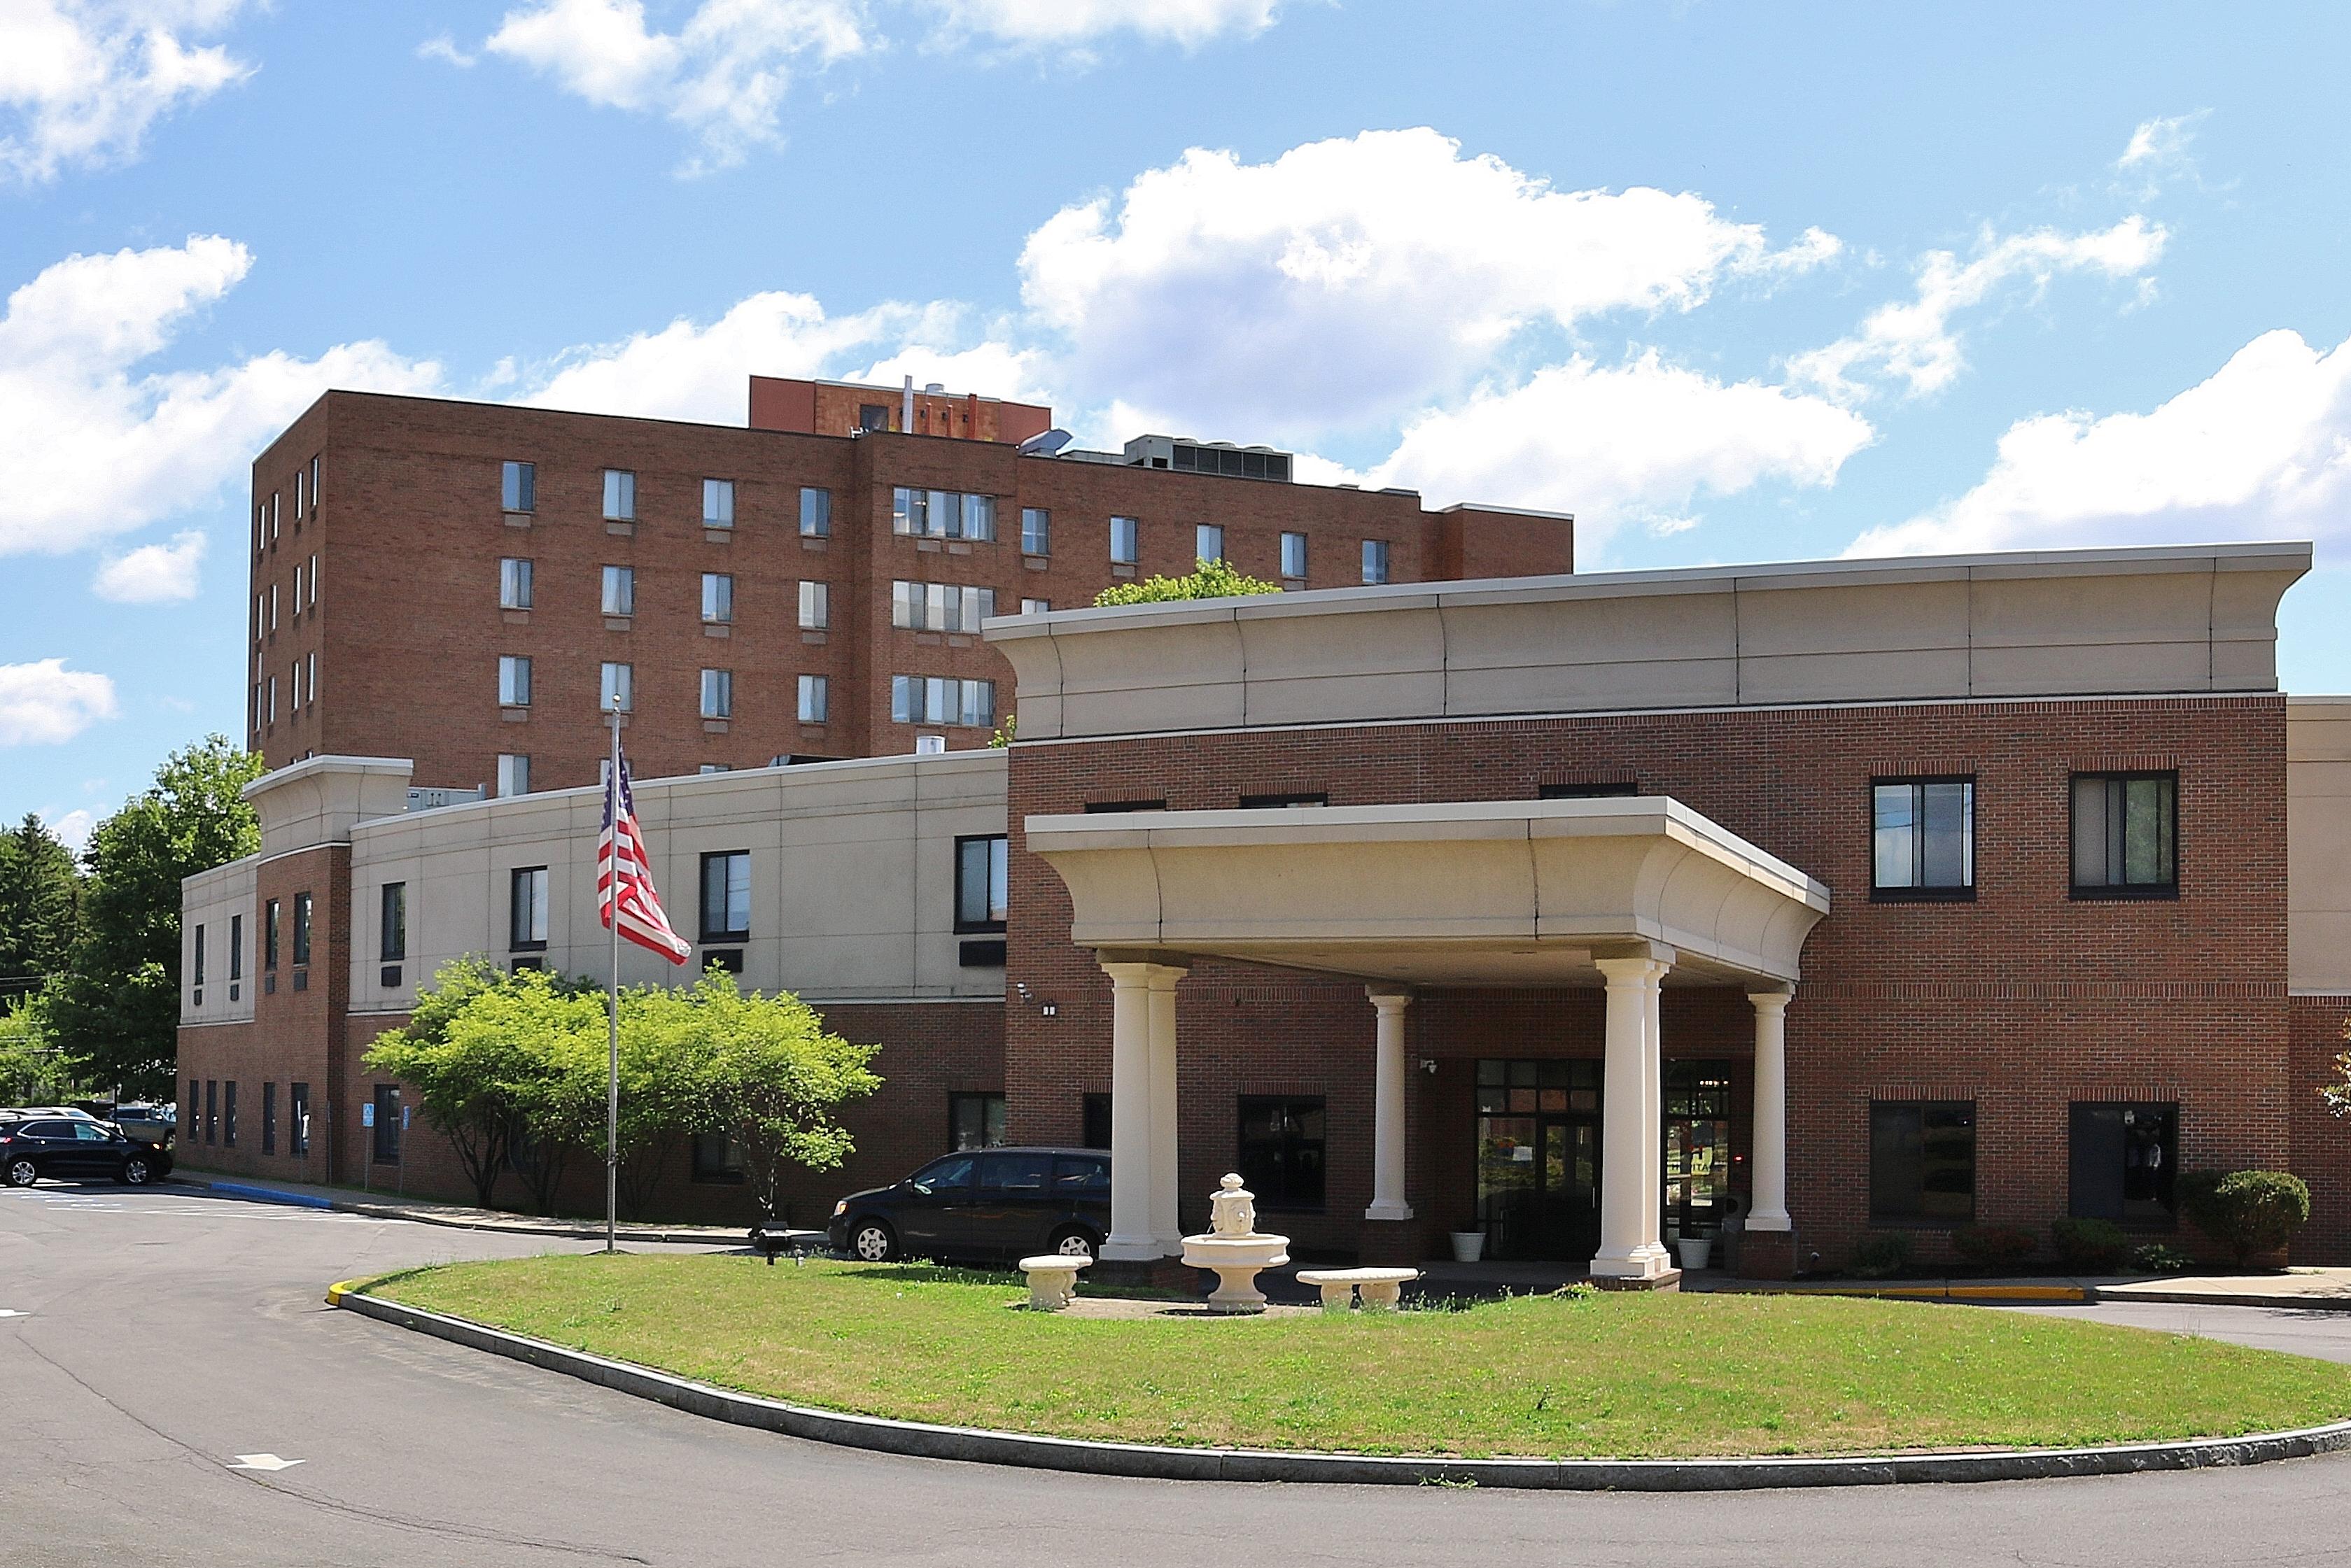 The Grand Rehabilitation and Nursing at <span>Utica</span>